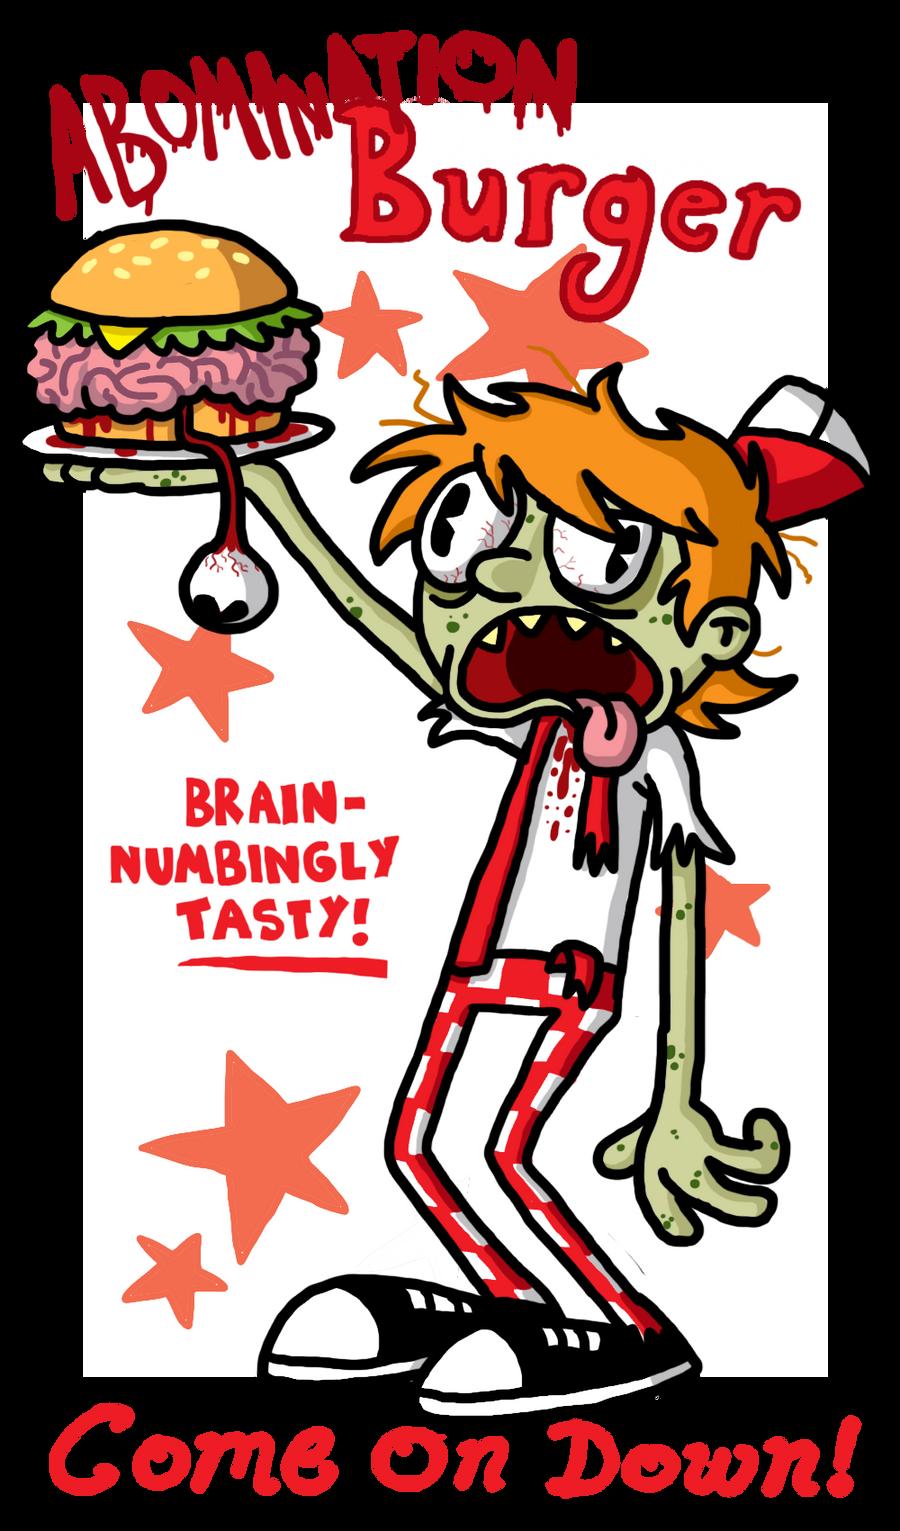 AbominationBurger's Profile Picture